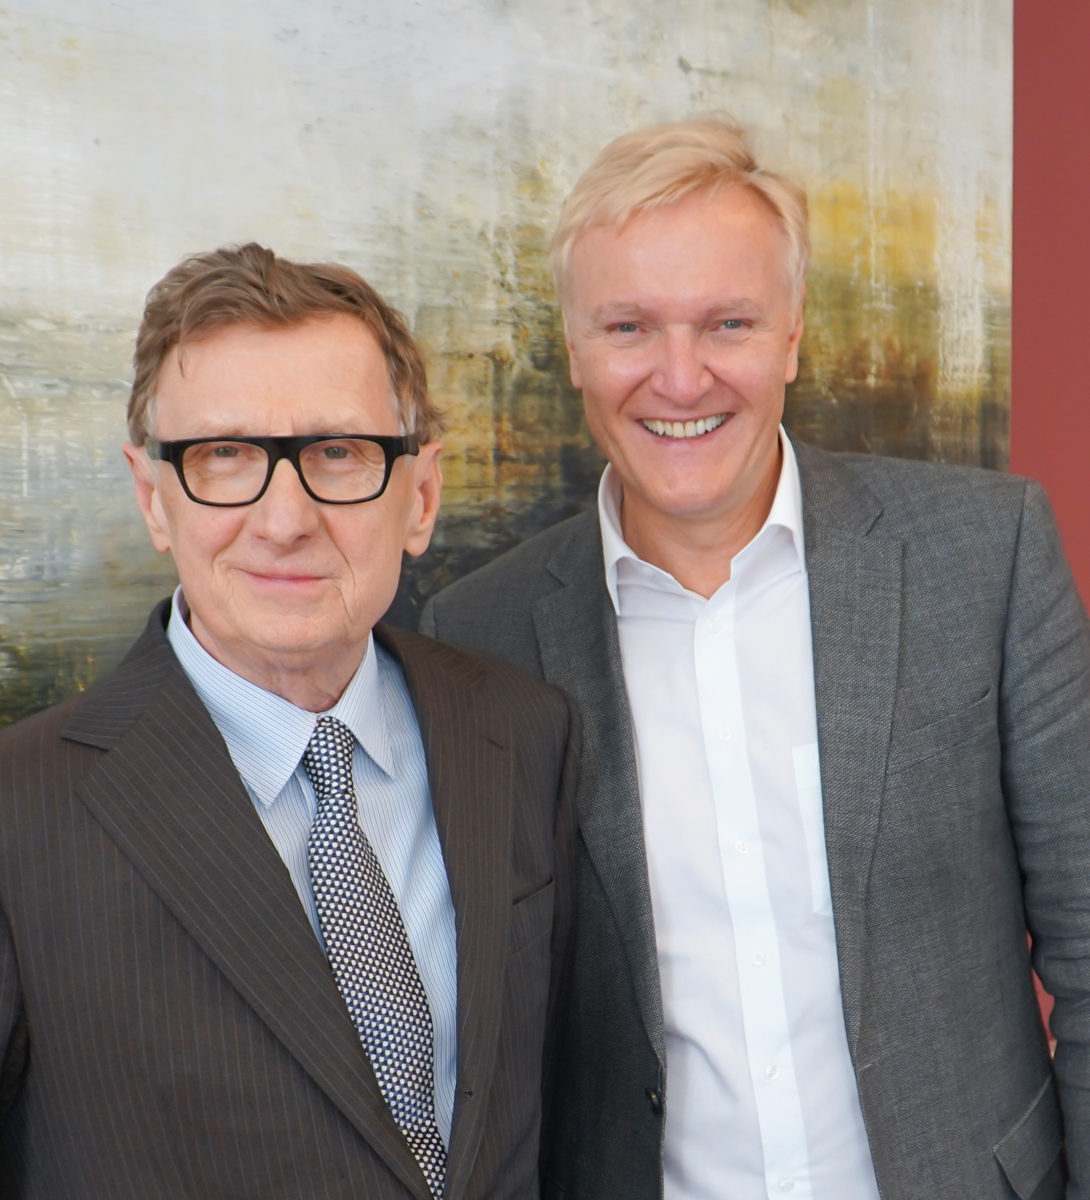 Rafael Jablonka, Klaus Albrecht Schröder, Foto Albertina, 2019